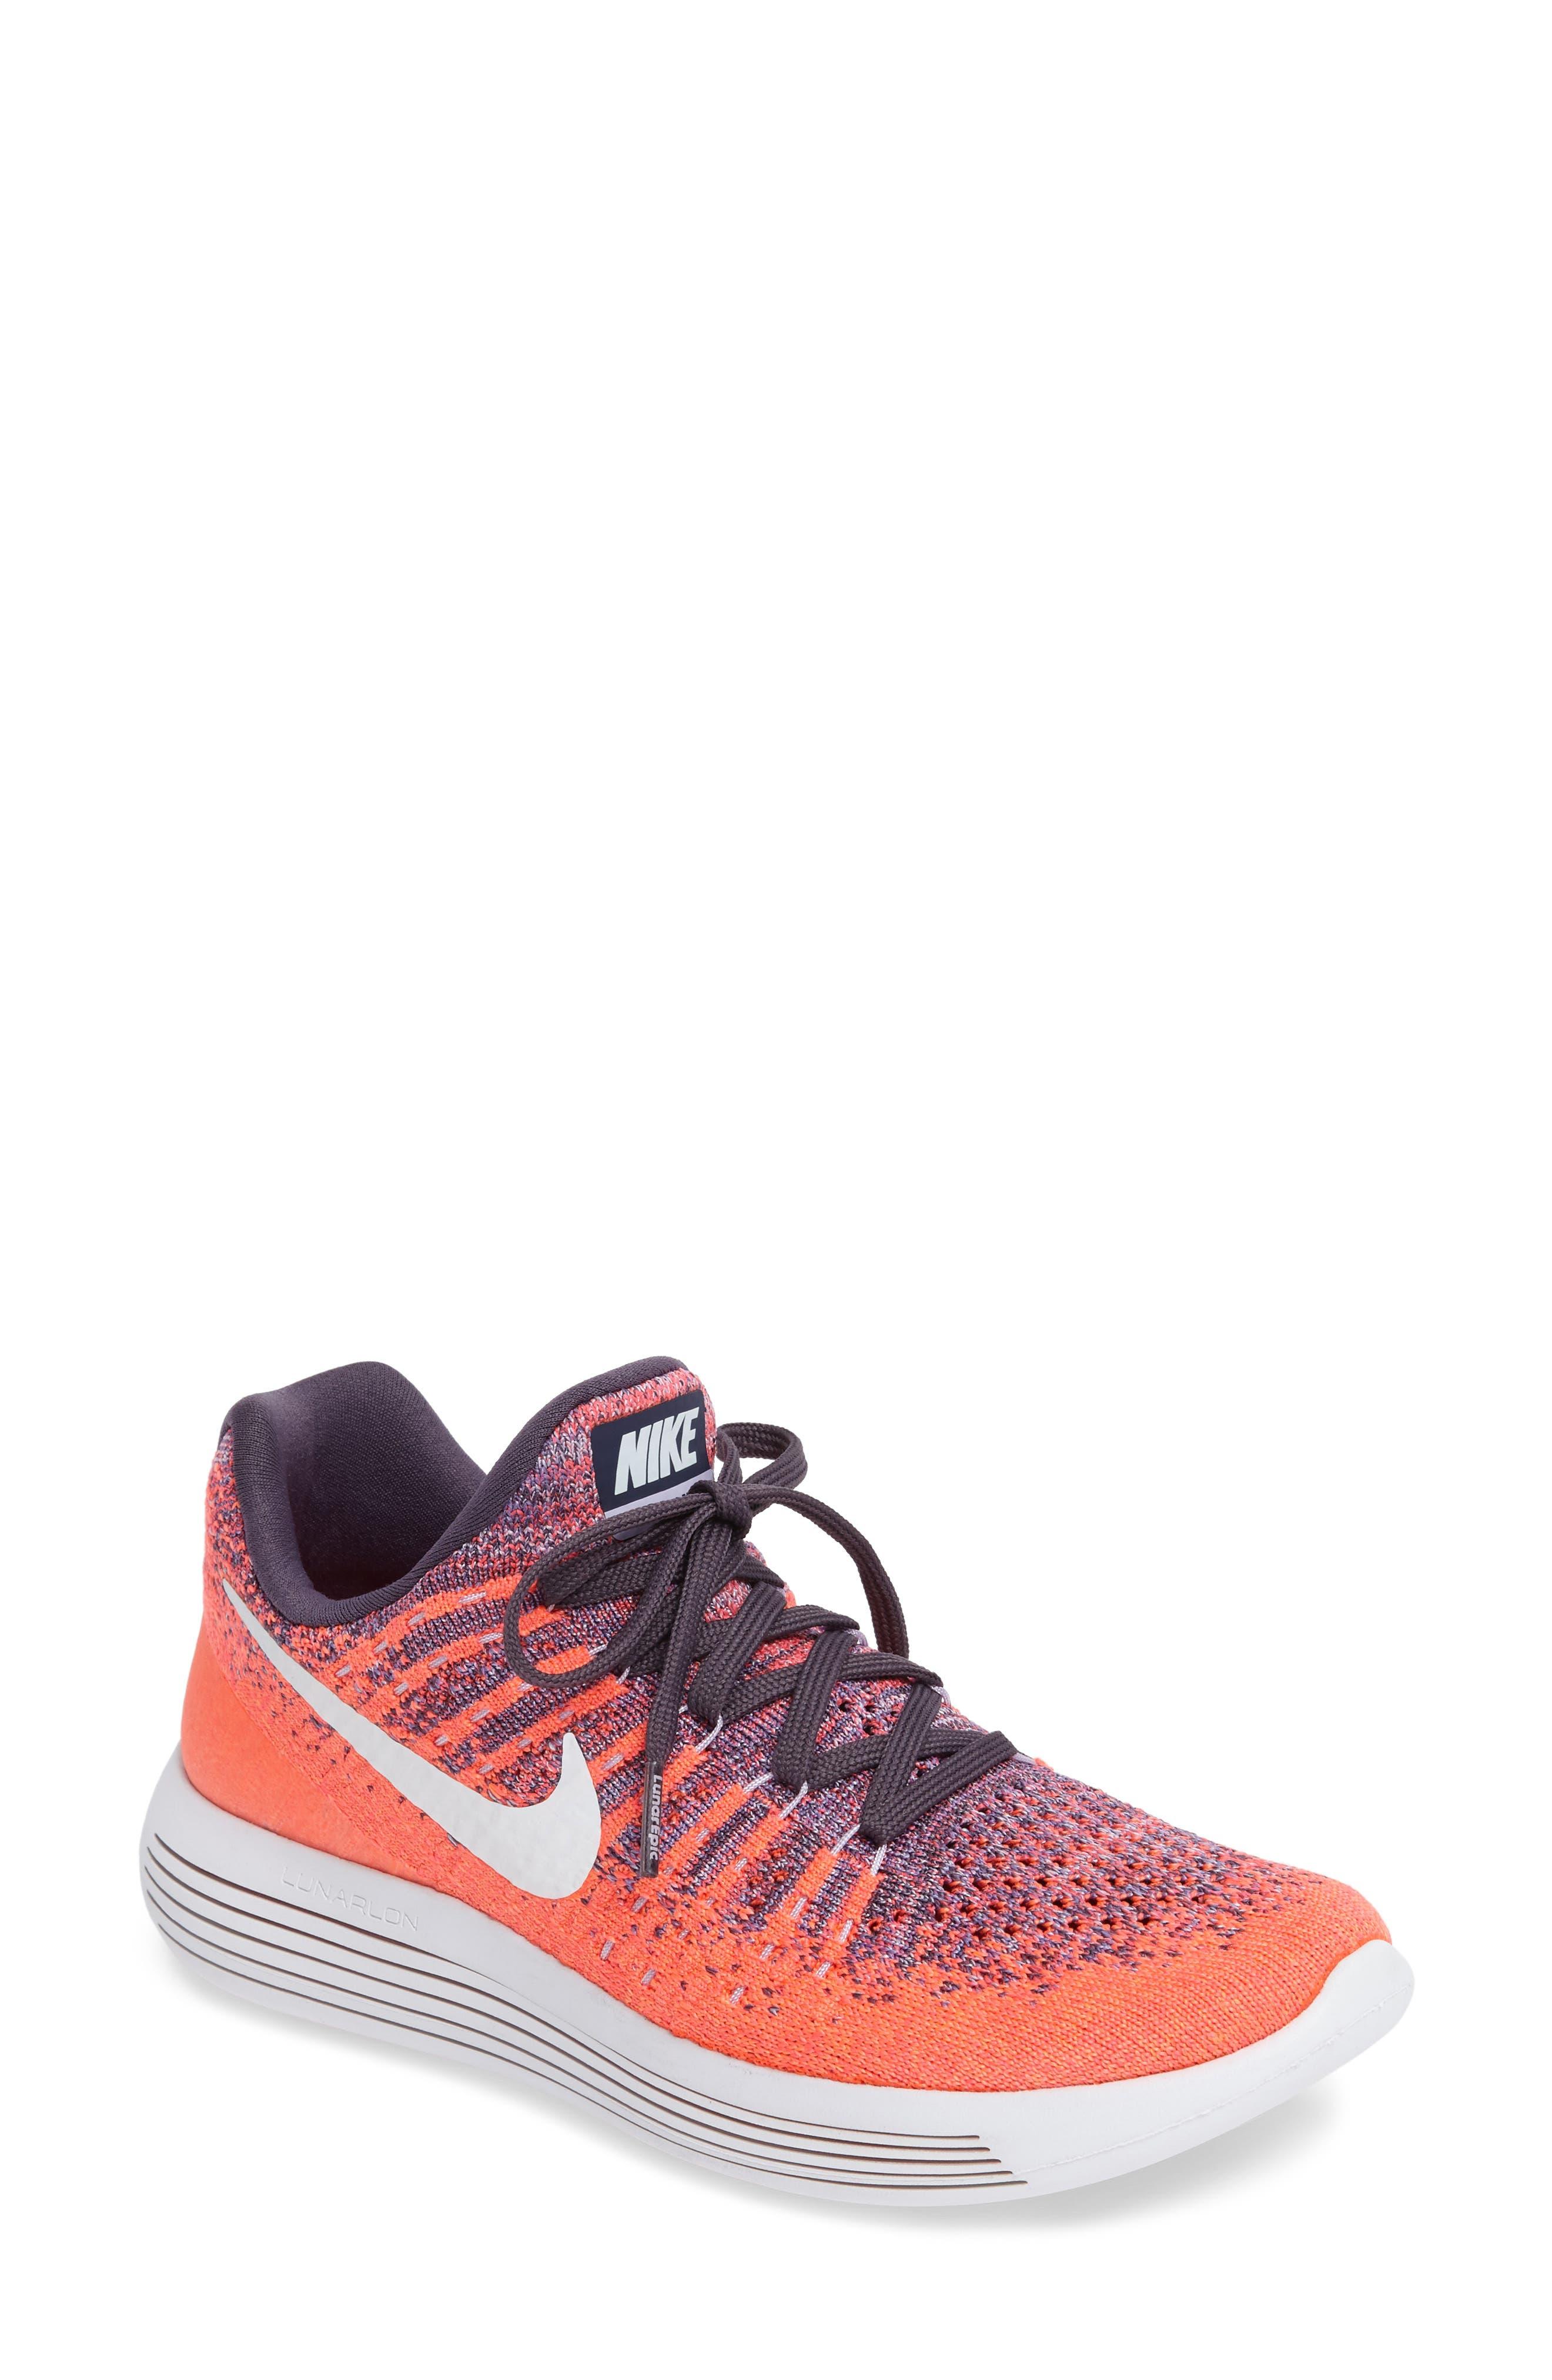 LunarEpic Low Flyknit 2 Running Shoe,                             Main thumbnail 18, color,